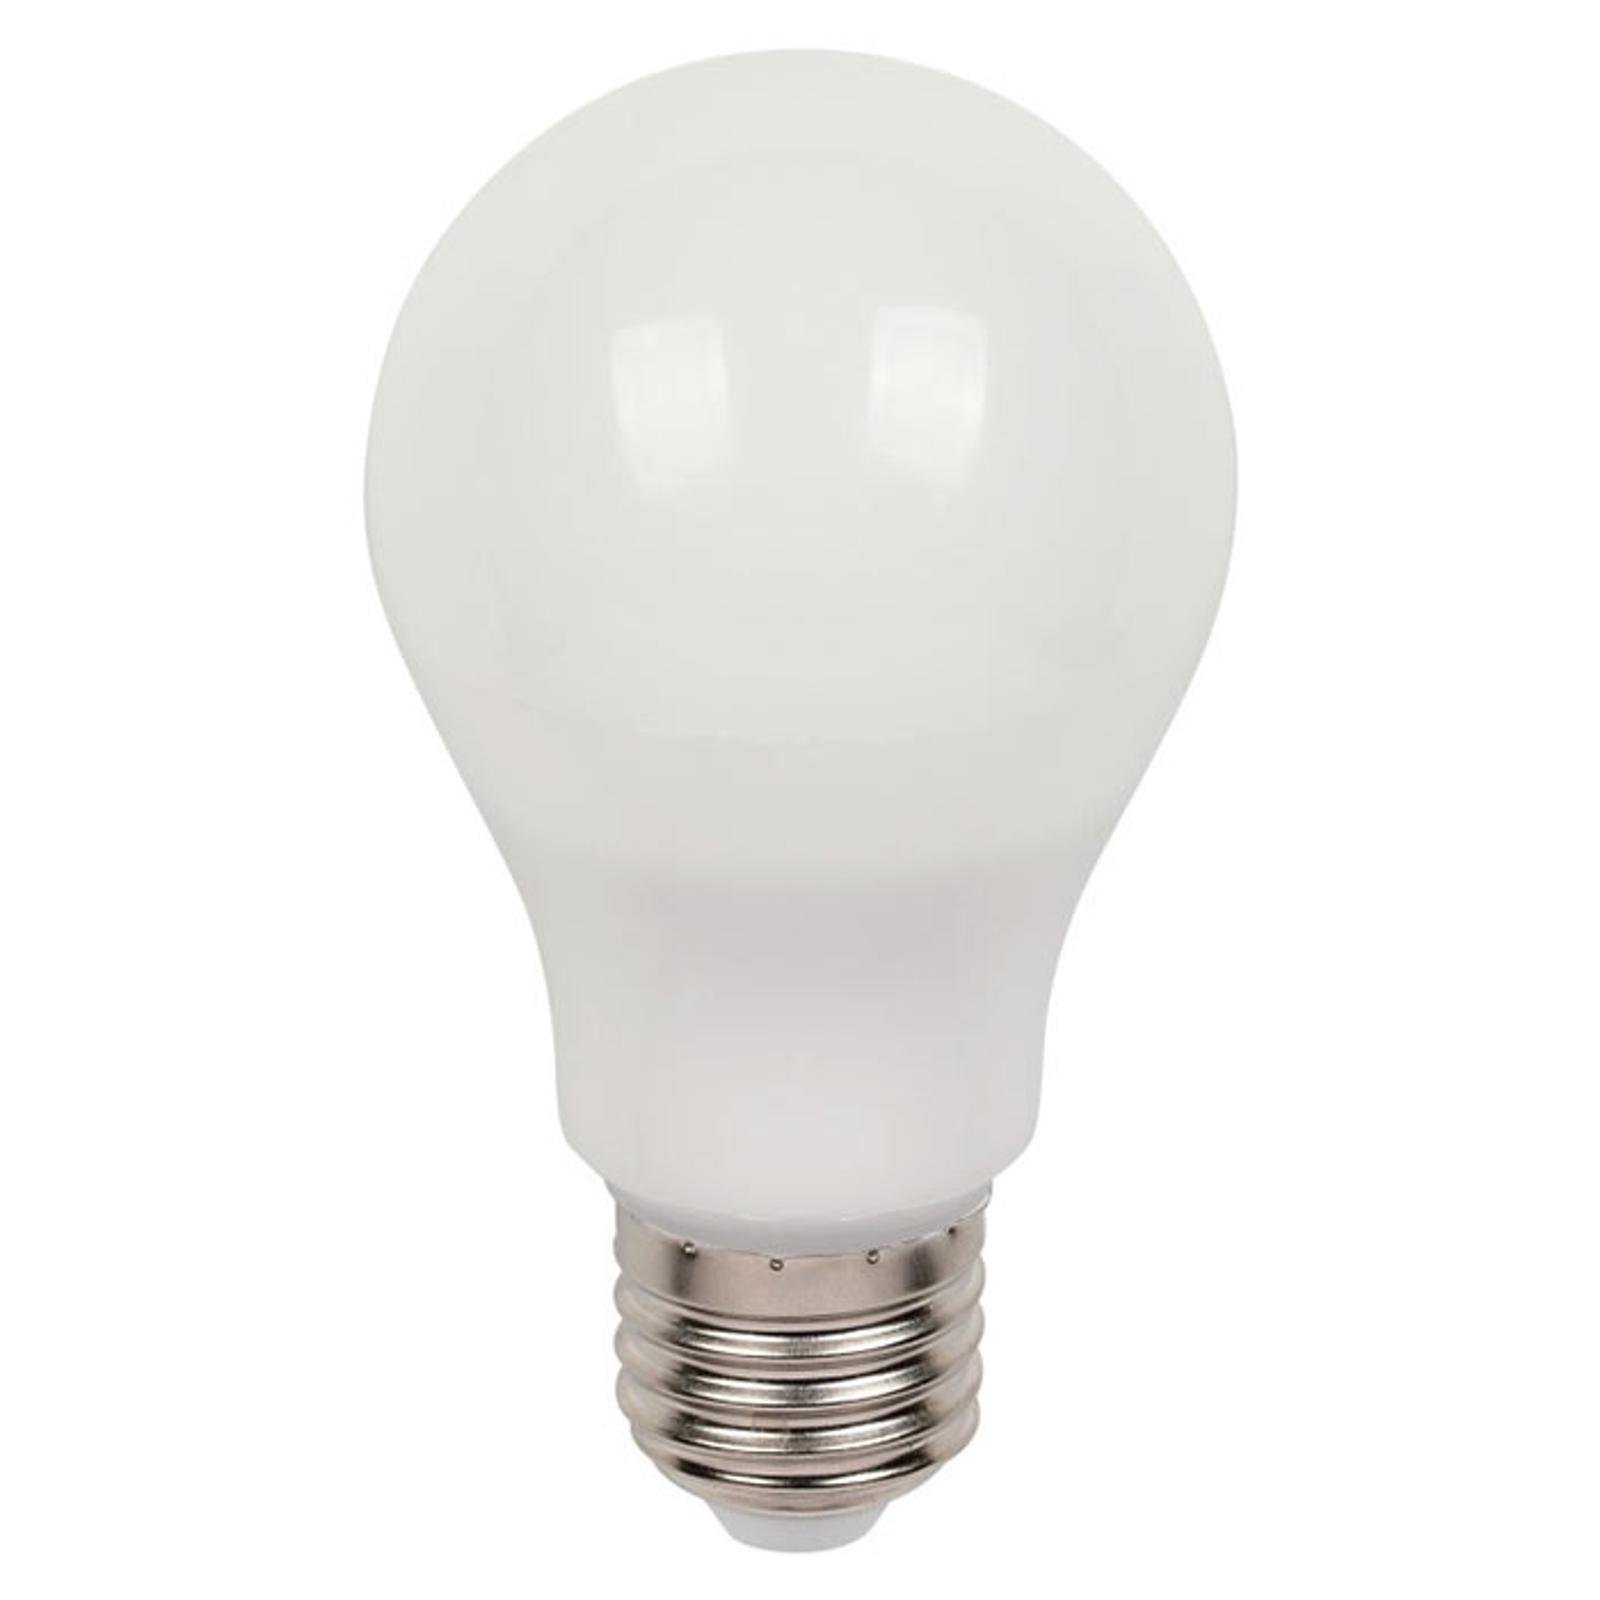 Westinghouse lampadina LED E27 9W 3.000K satinato